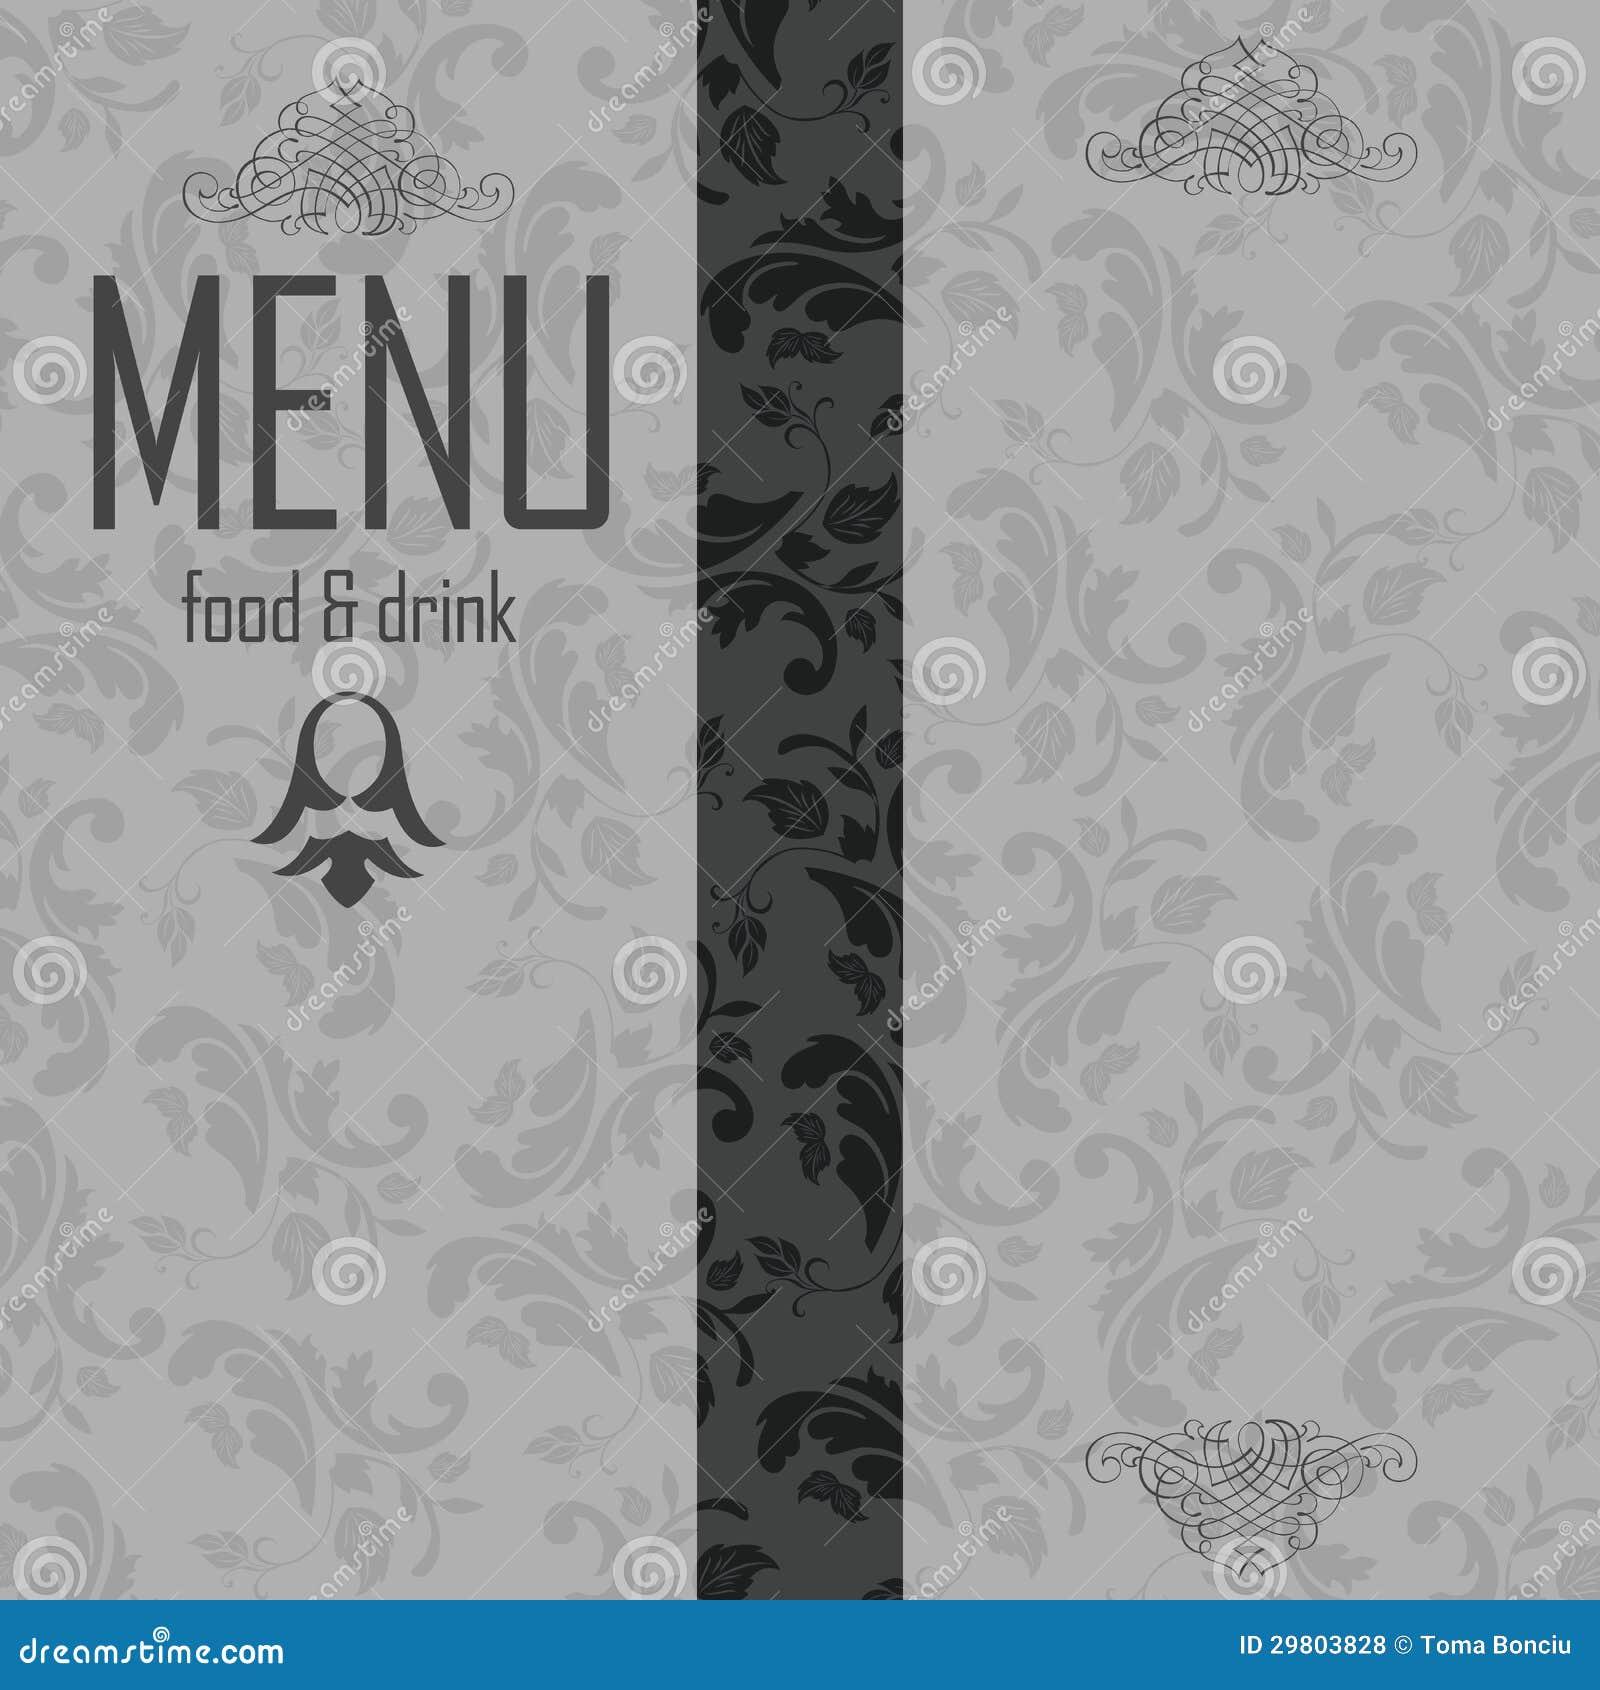 fine dining appetizer gourmet restaurant stock illustrations 42